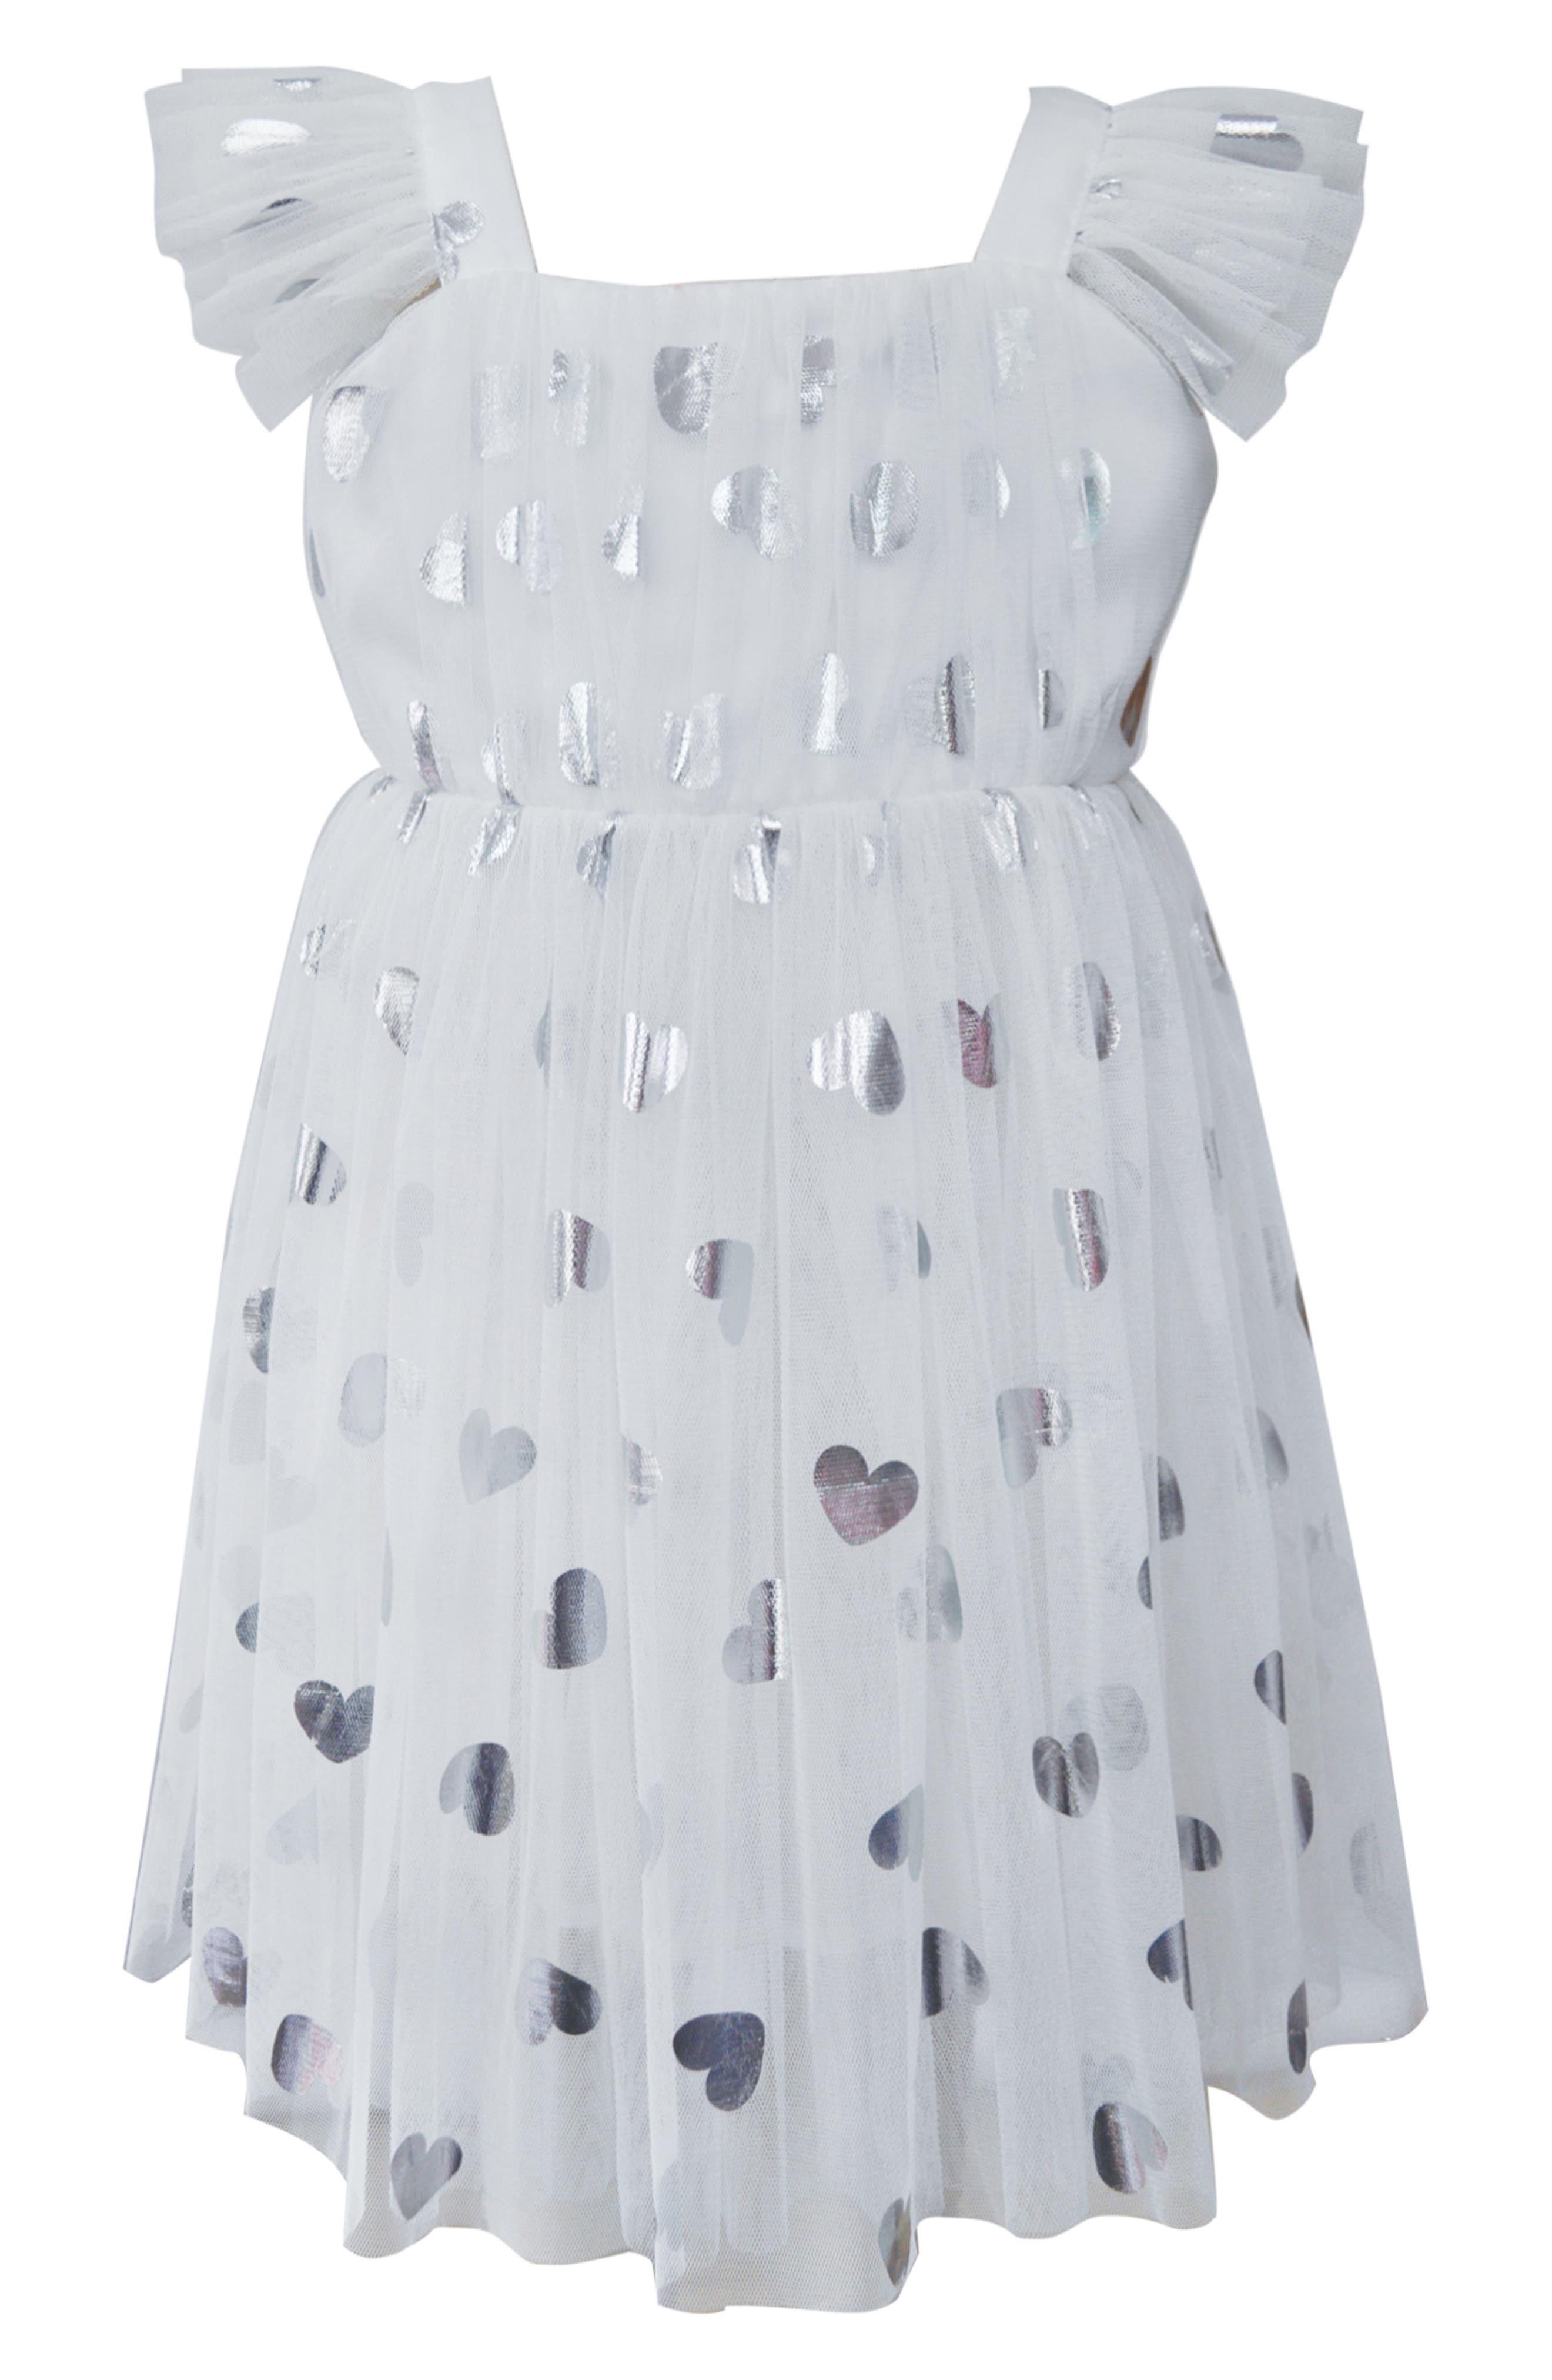 9c146e3de Girl's Popatu Silver Heart Embellished Tulle Dress, White